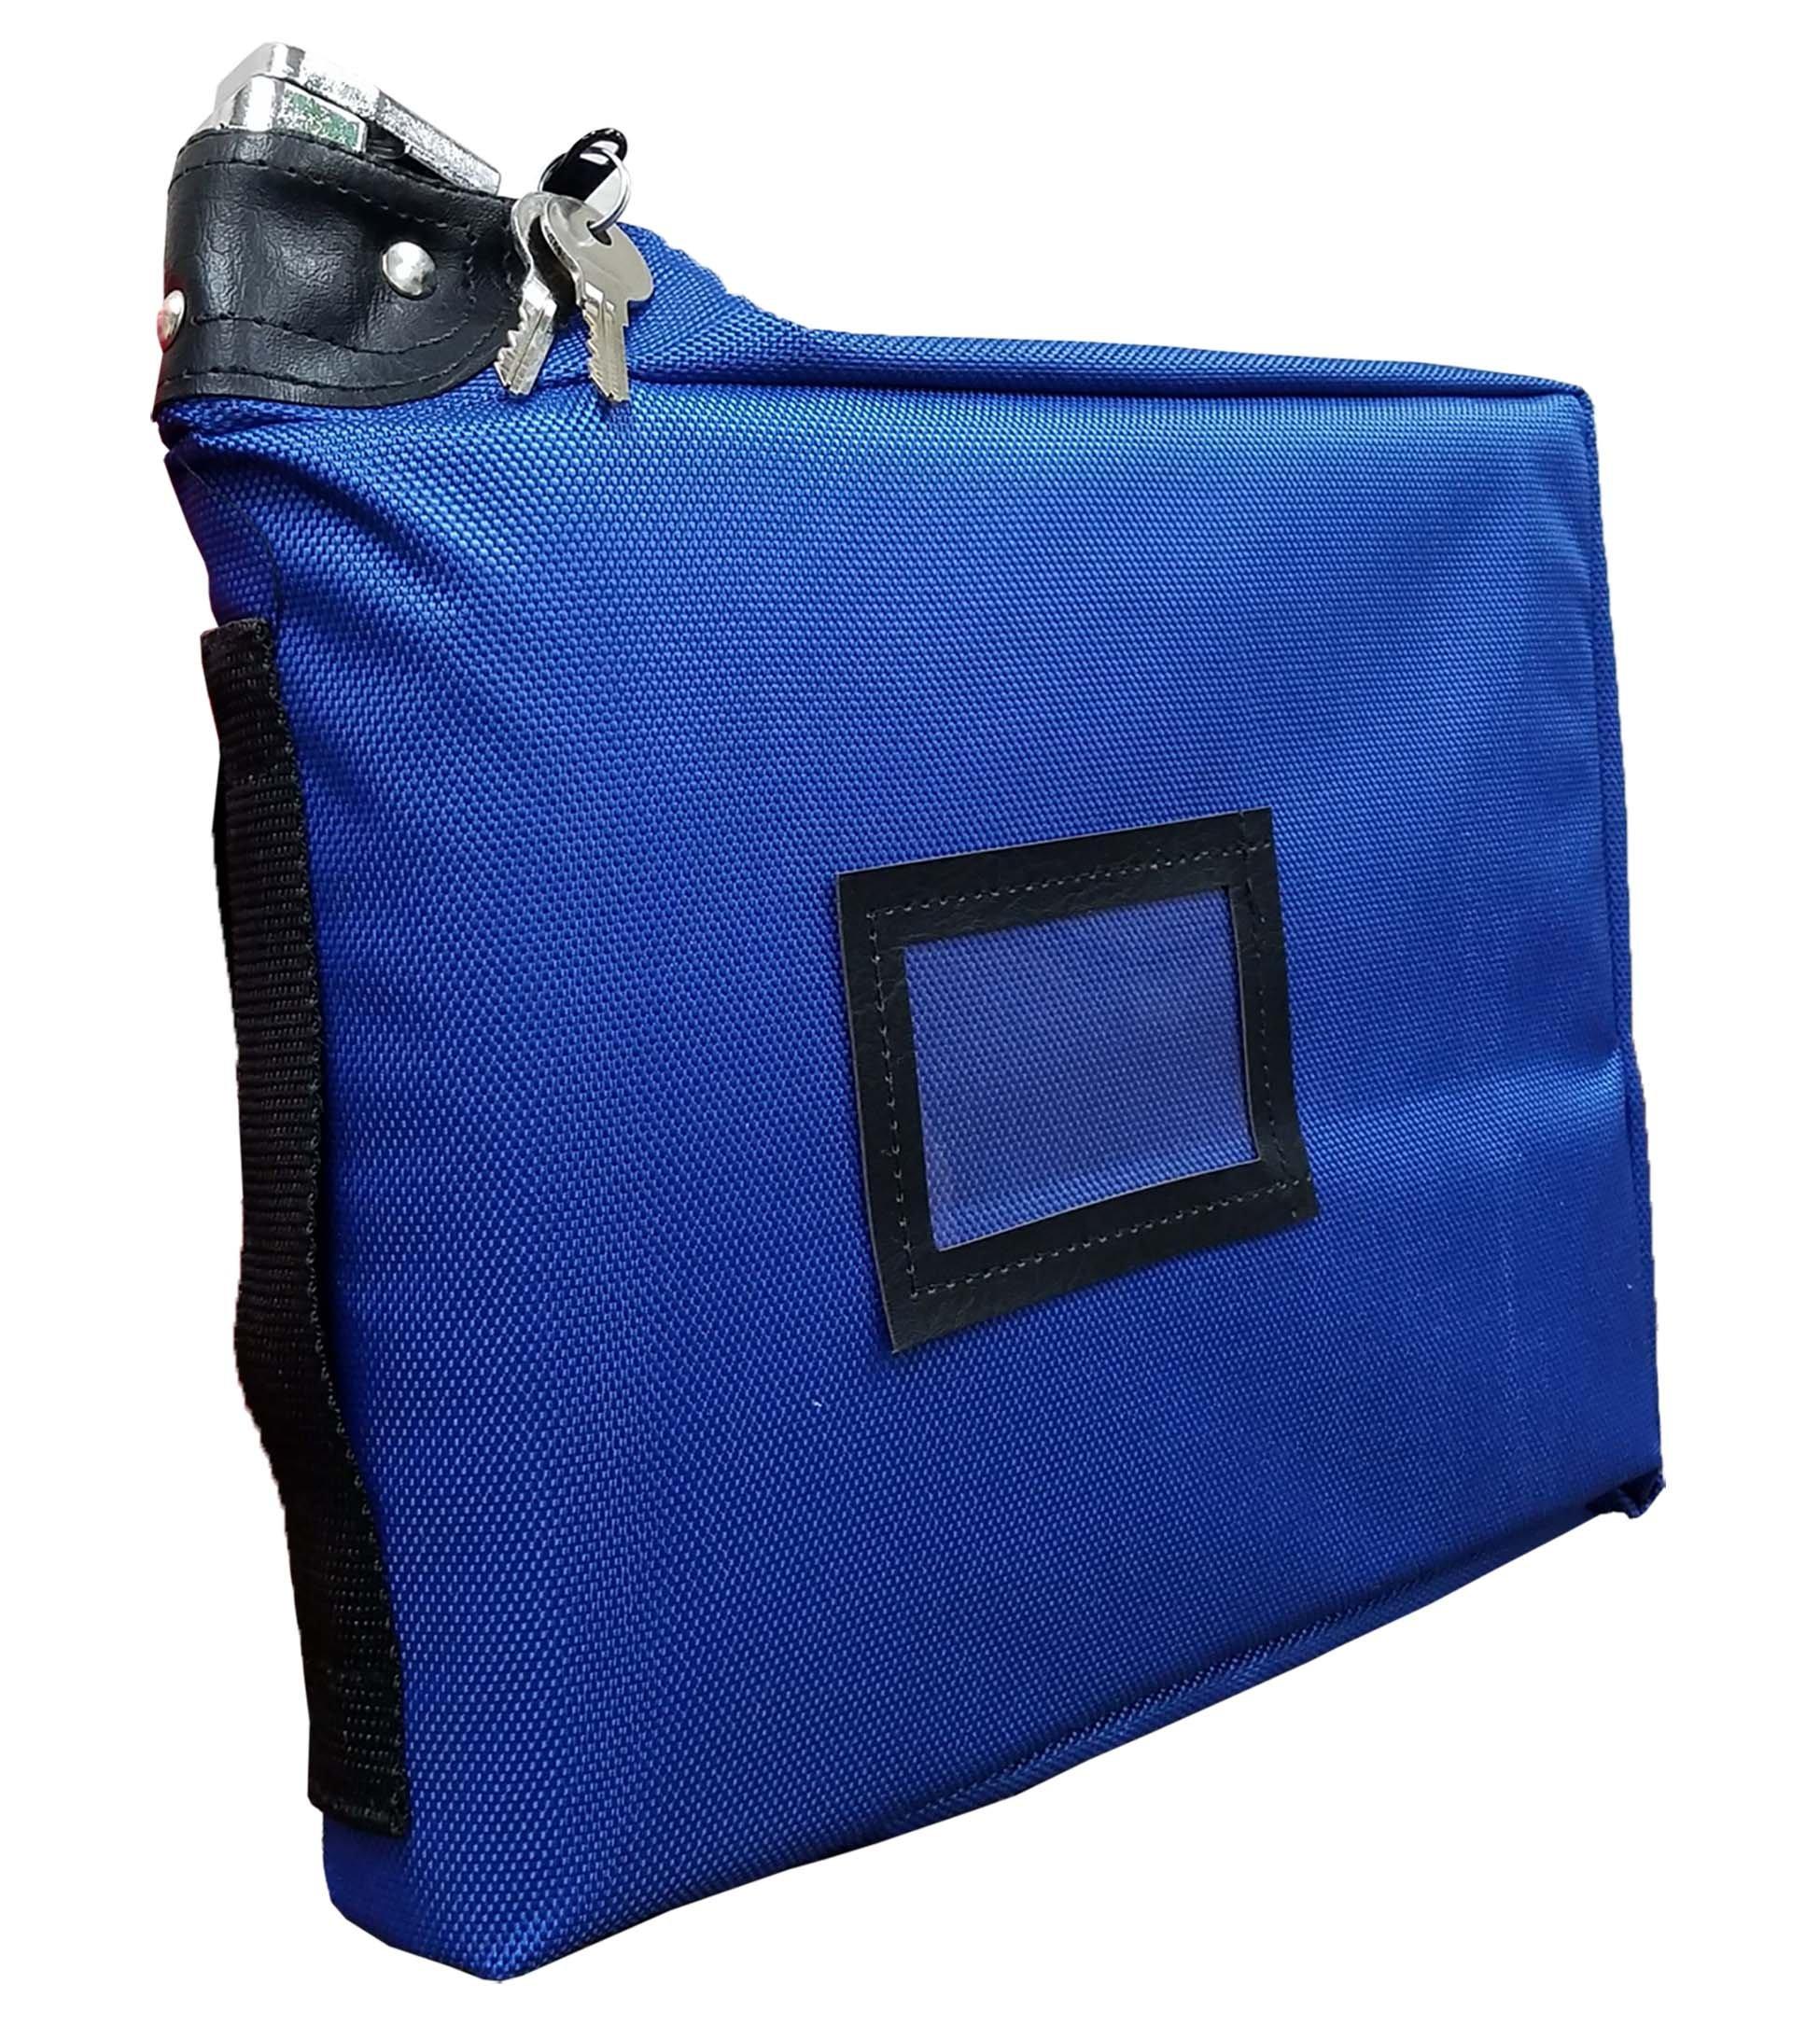 Prescription Medication Bag Standard Lock Travel Case (Blue) by Cardinal bag supplies